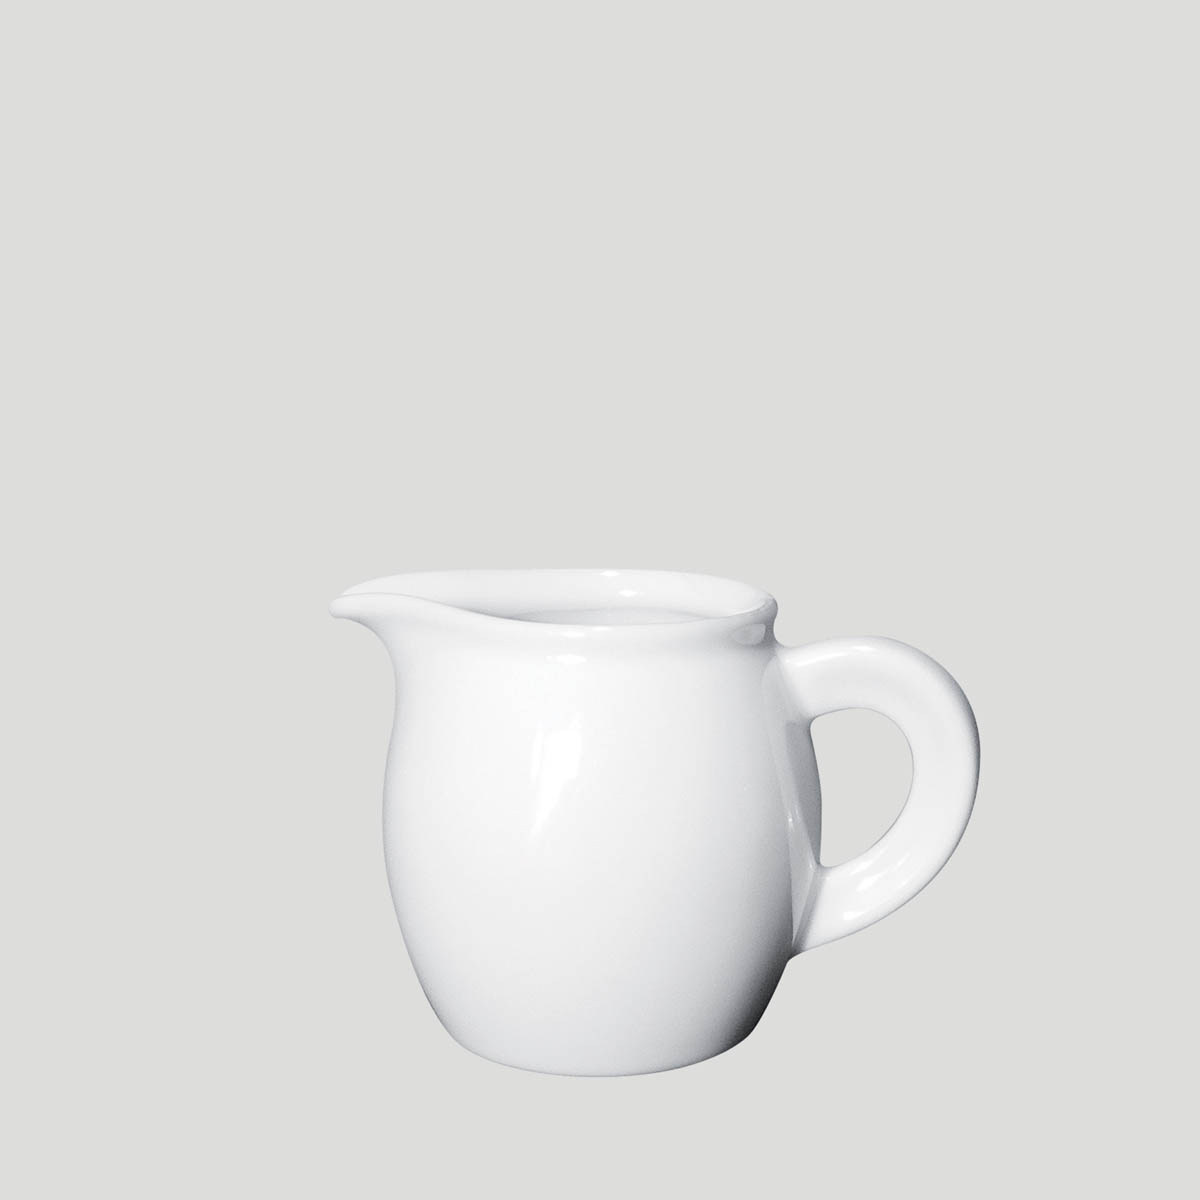 Lattiera - lattiera in porcellana - Gardagel